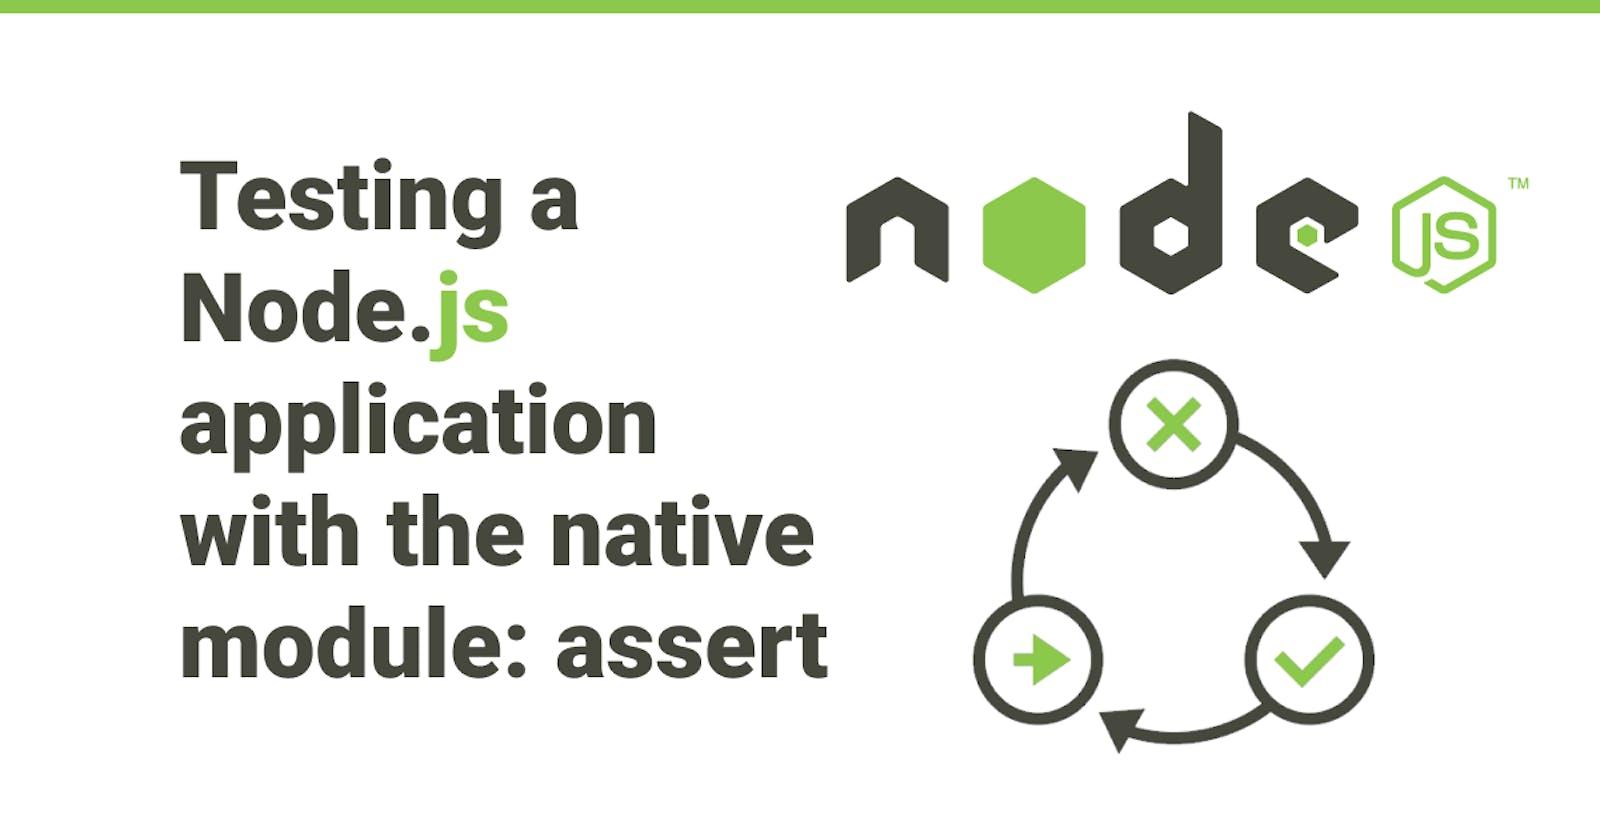 Testing a Node.js application with the native module: assert